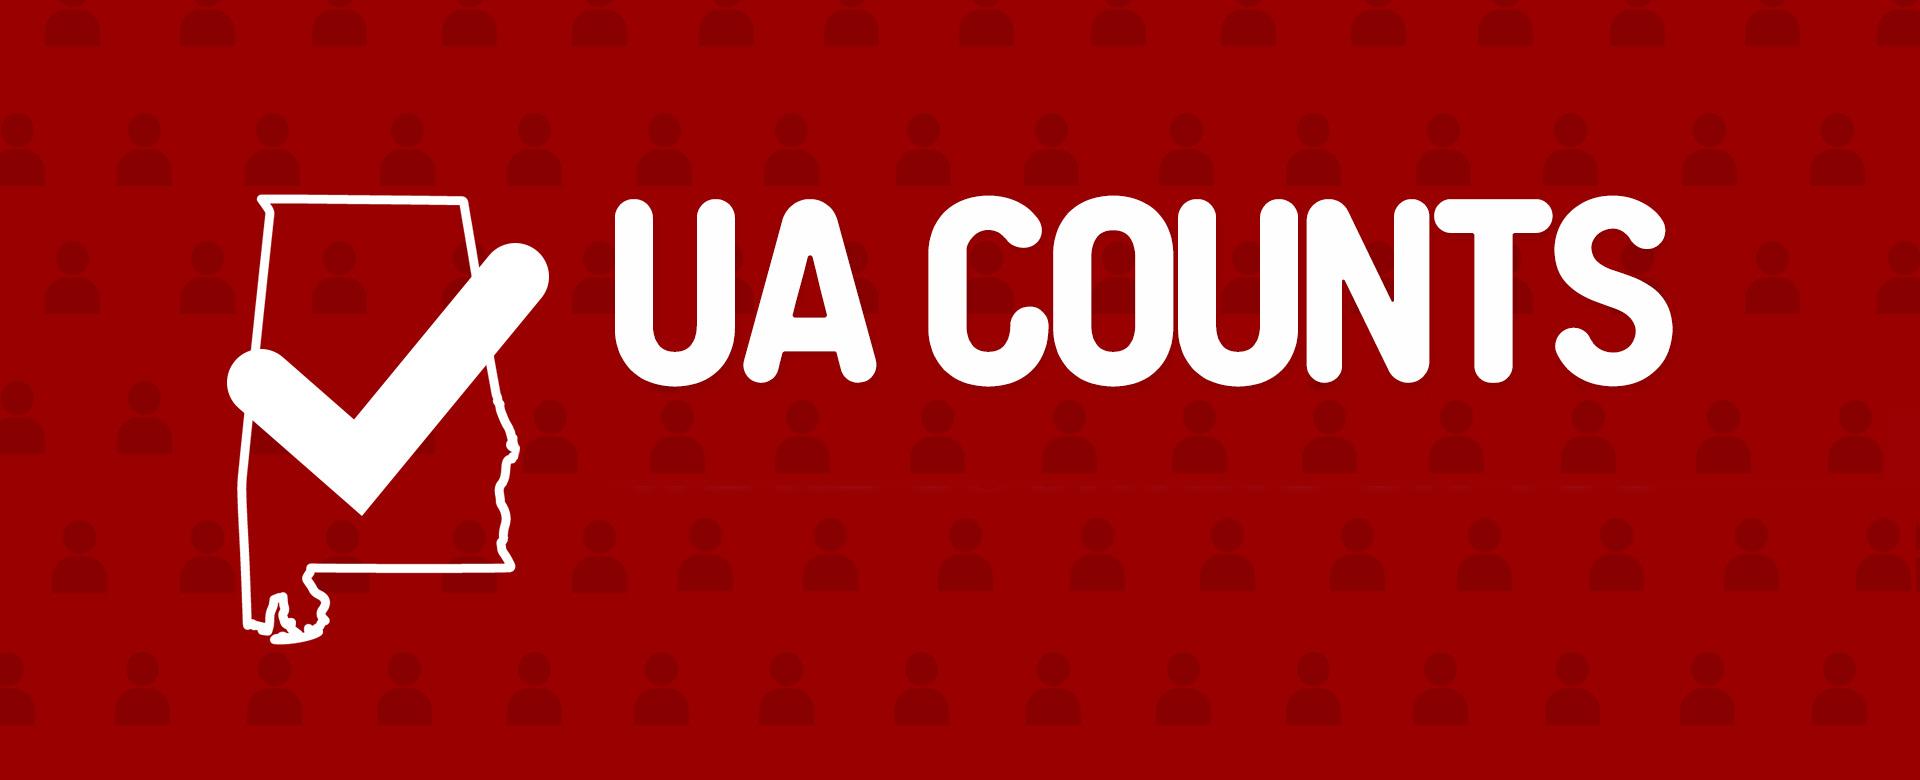 UA Counts Website Header